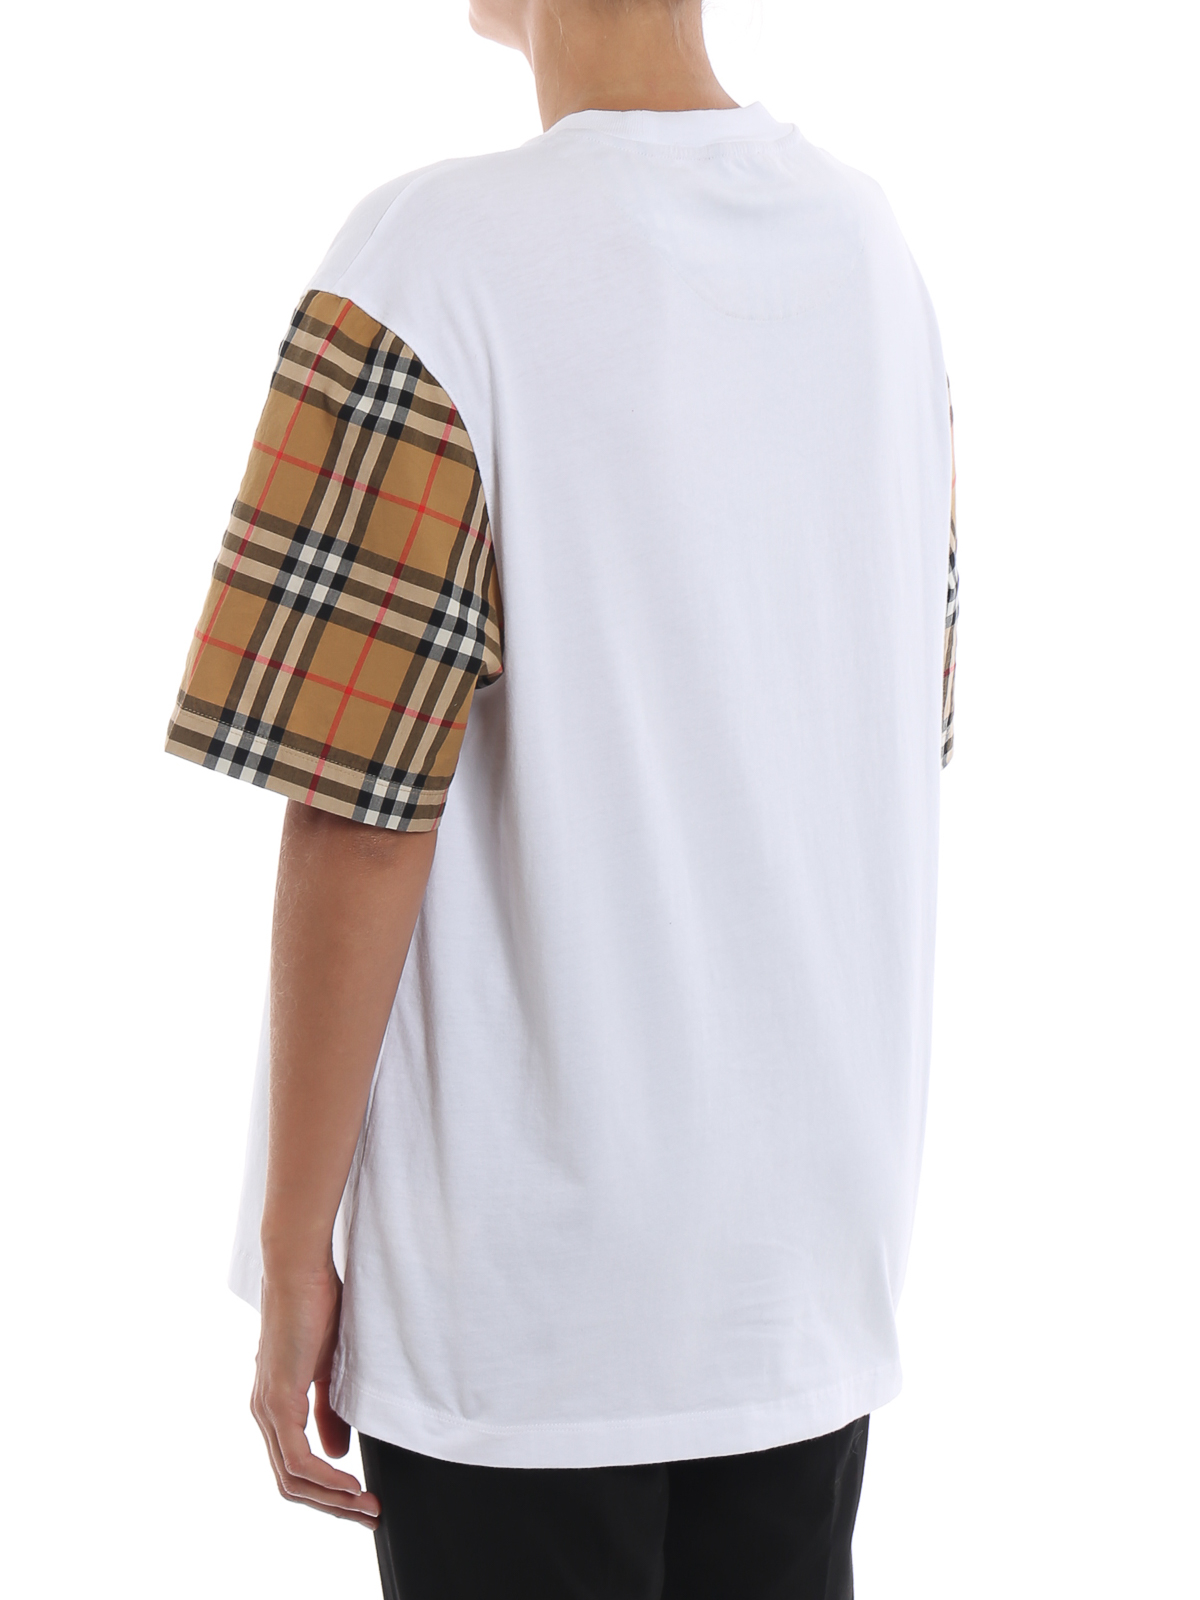 fe7740ad40 Burberry - Serra vintage check sleeve white cotton Tee - t-shirts ...